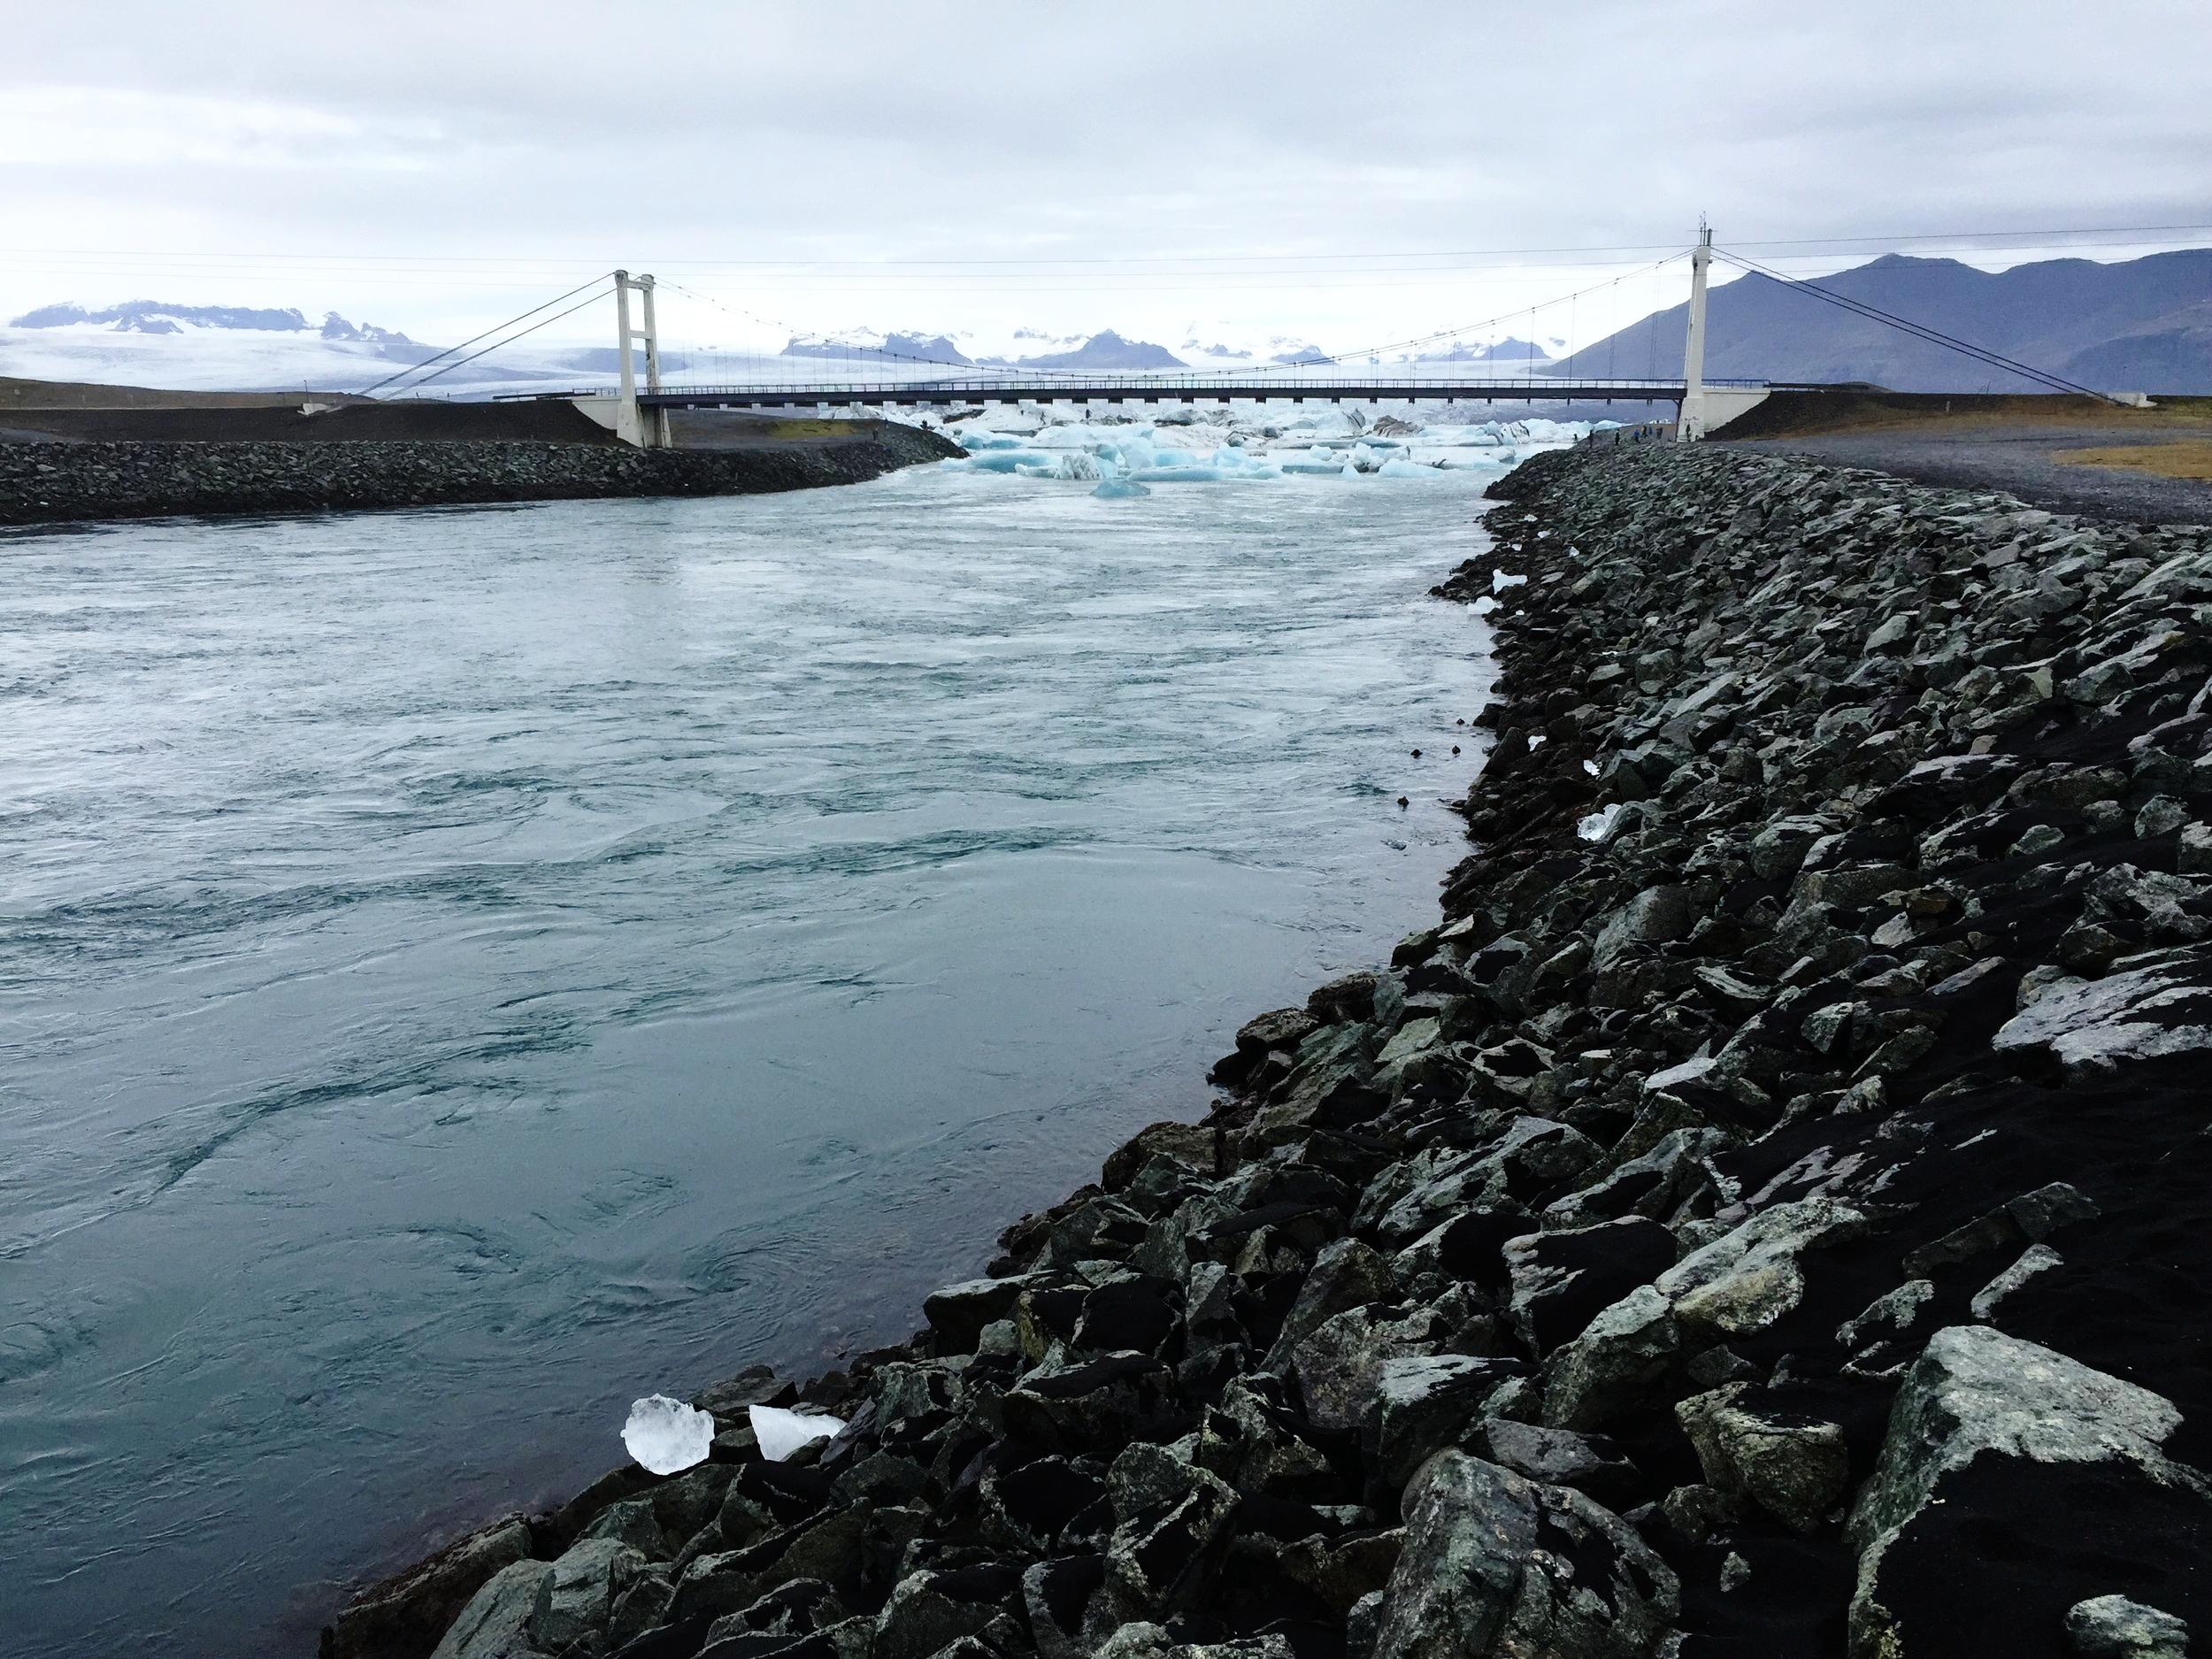 My favorite bridge in Iceland